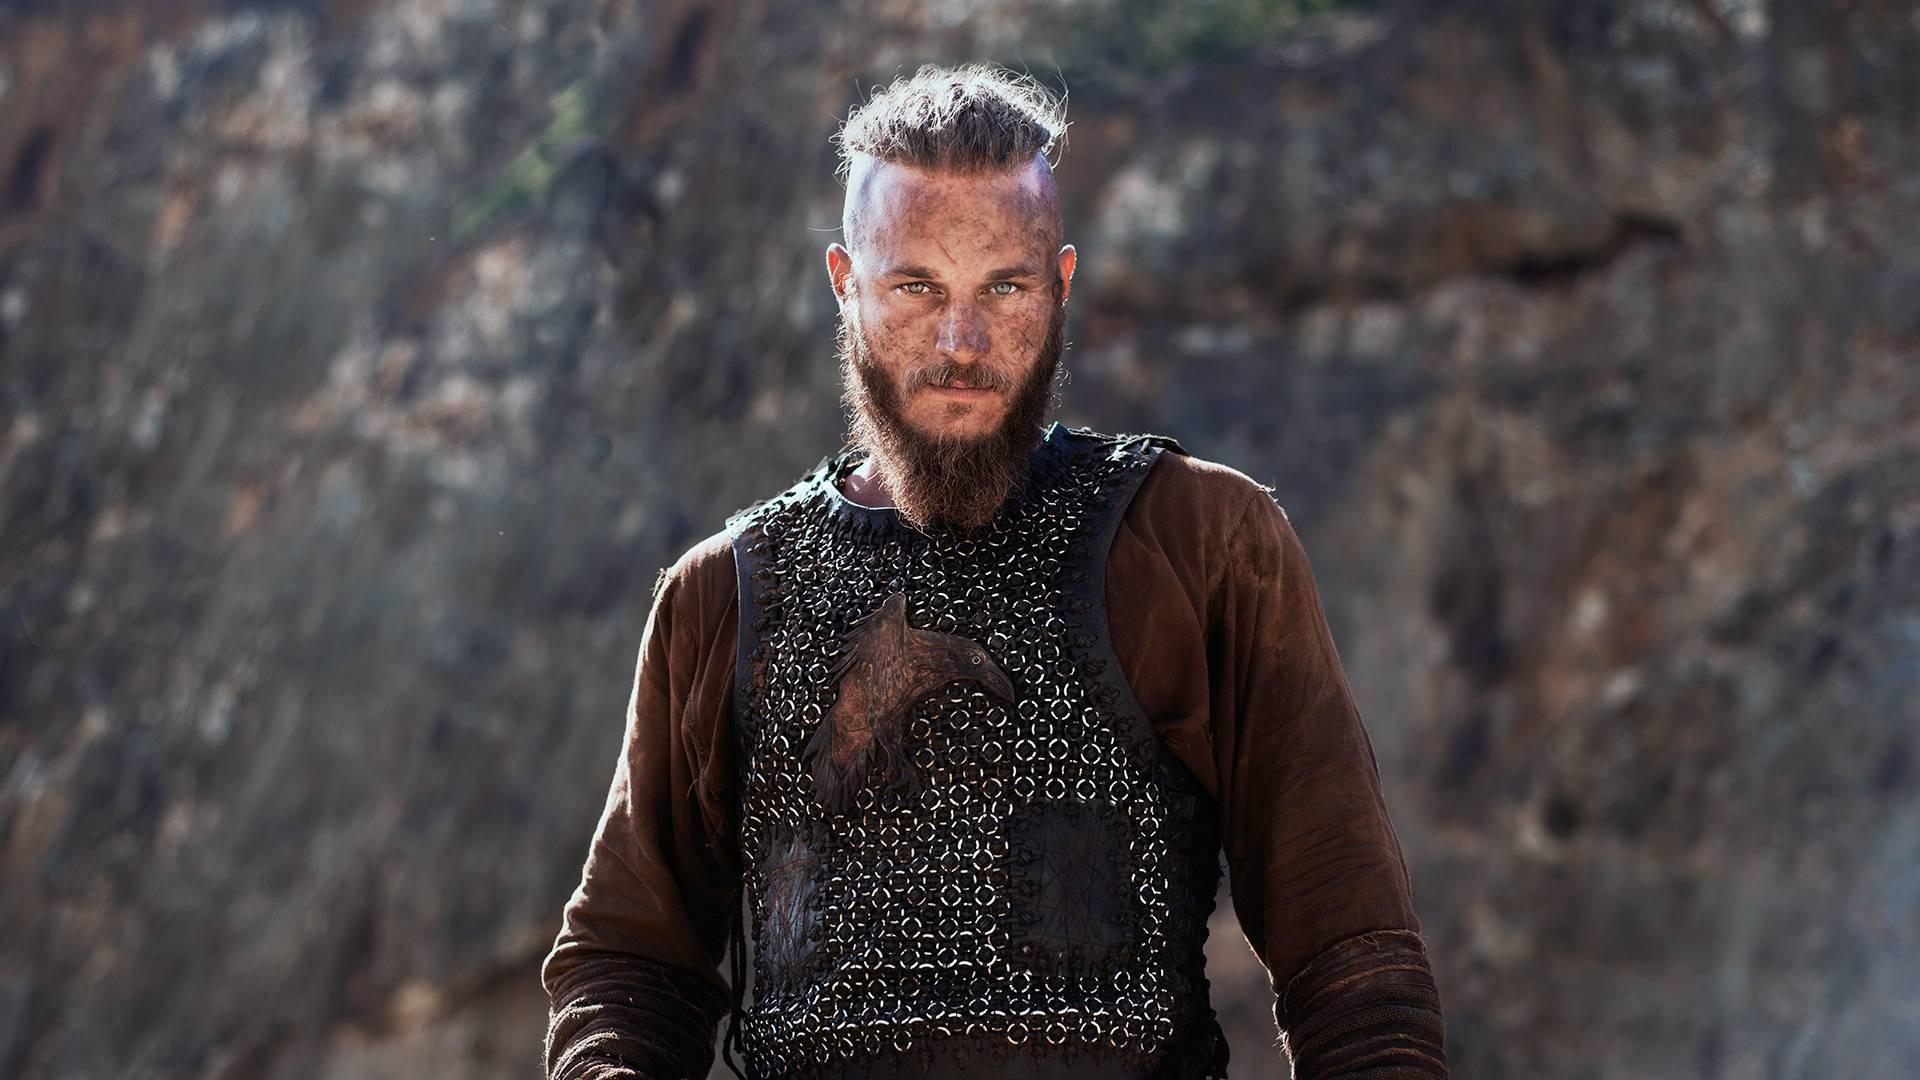 Ragnar Lothbrok High Definition Wallpapers